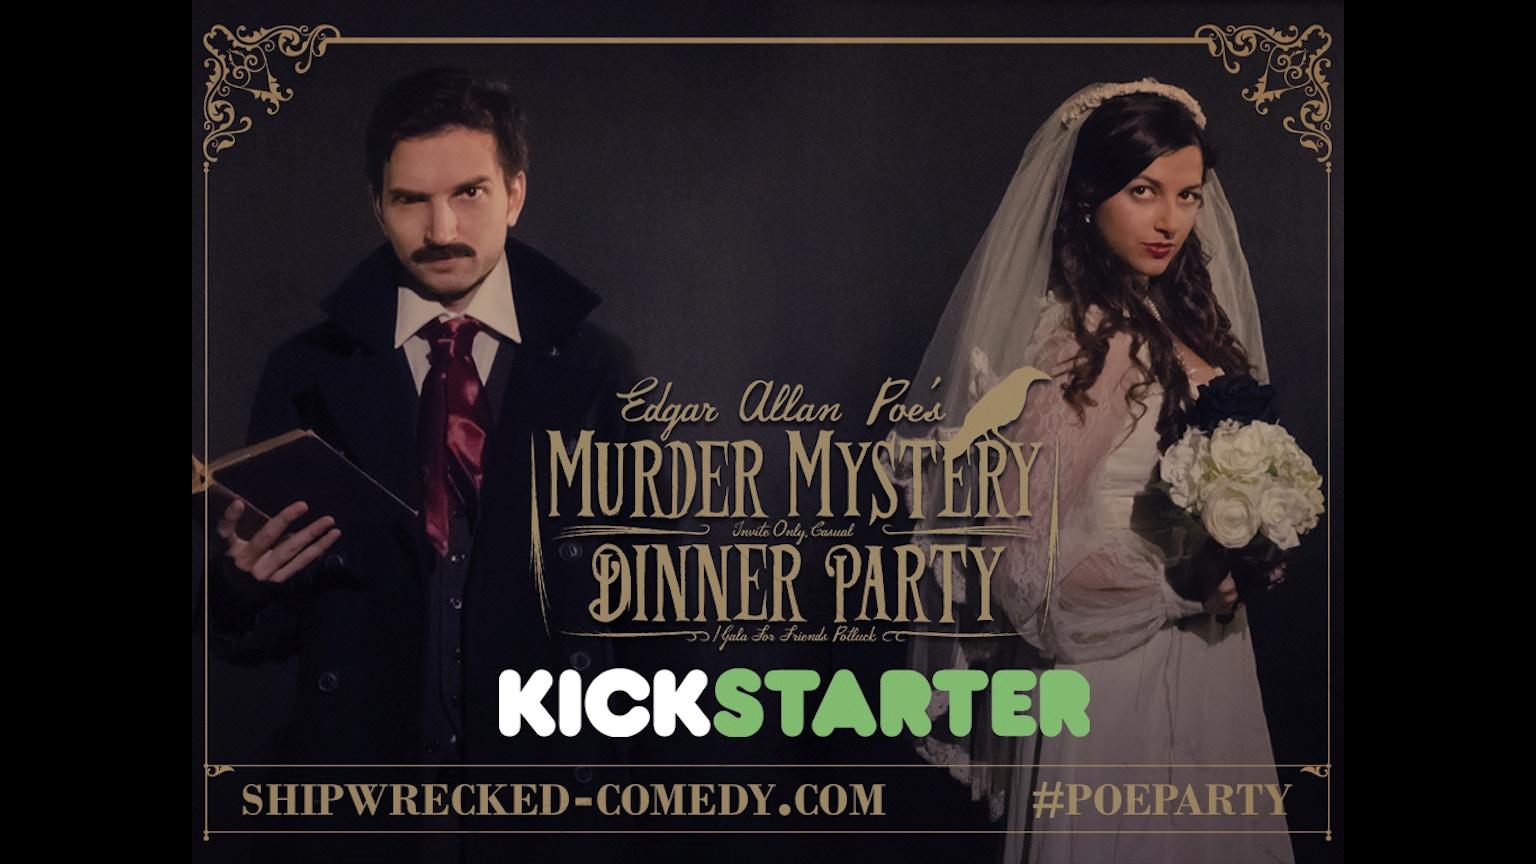 Help writing a parody of a murder mystery?